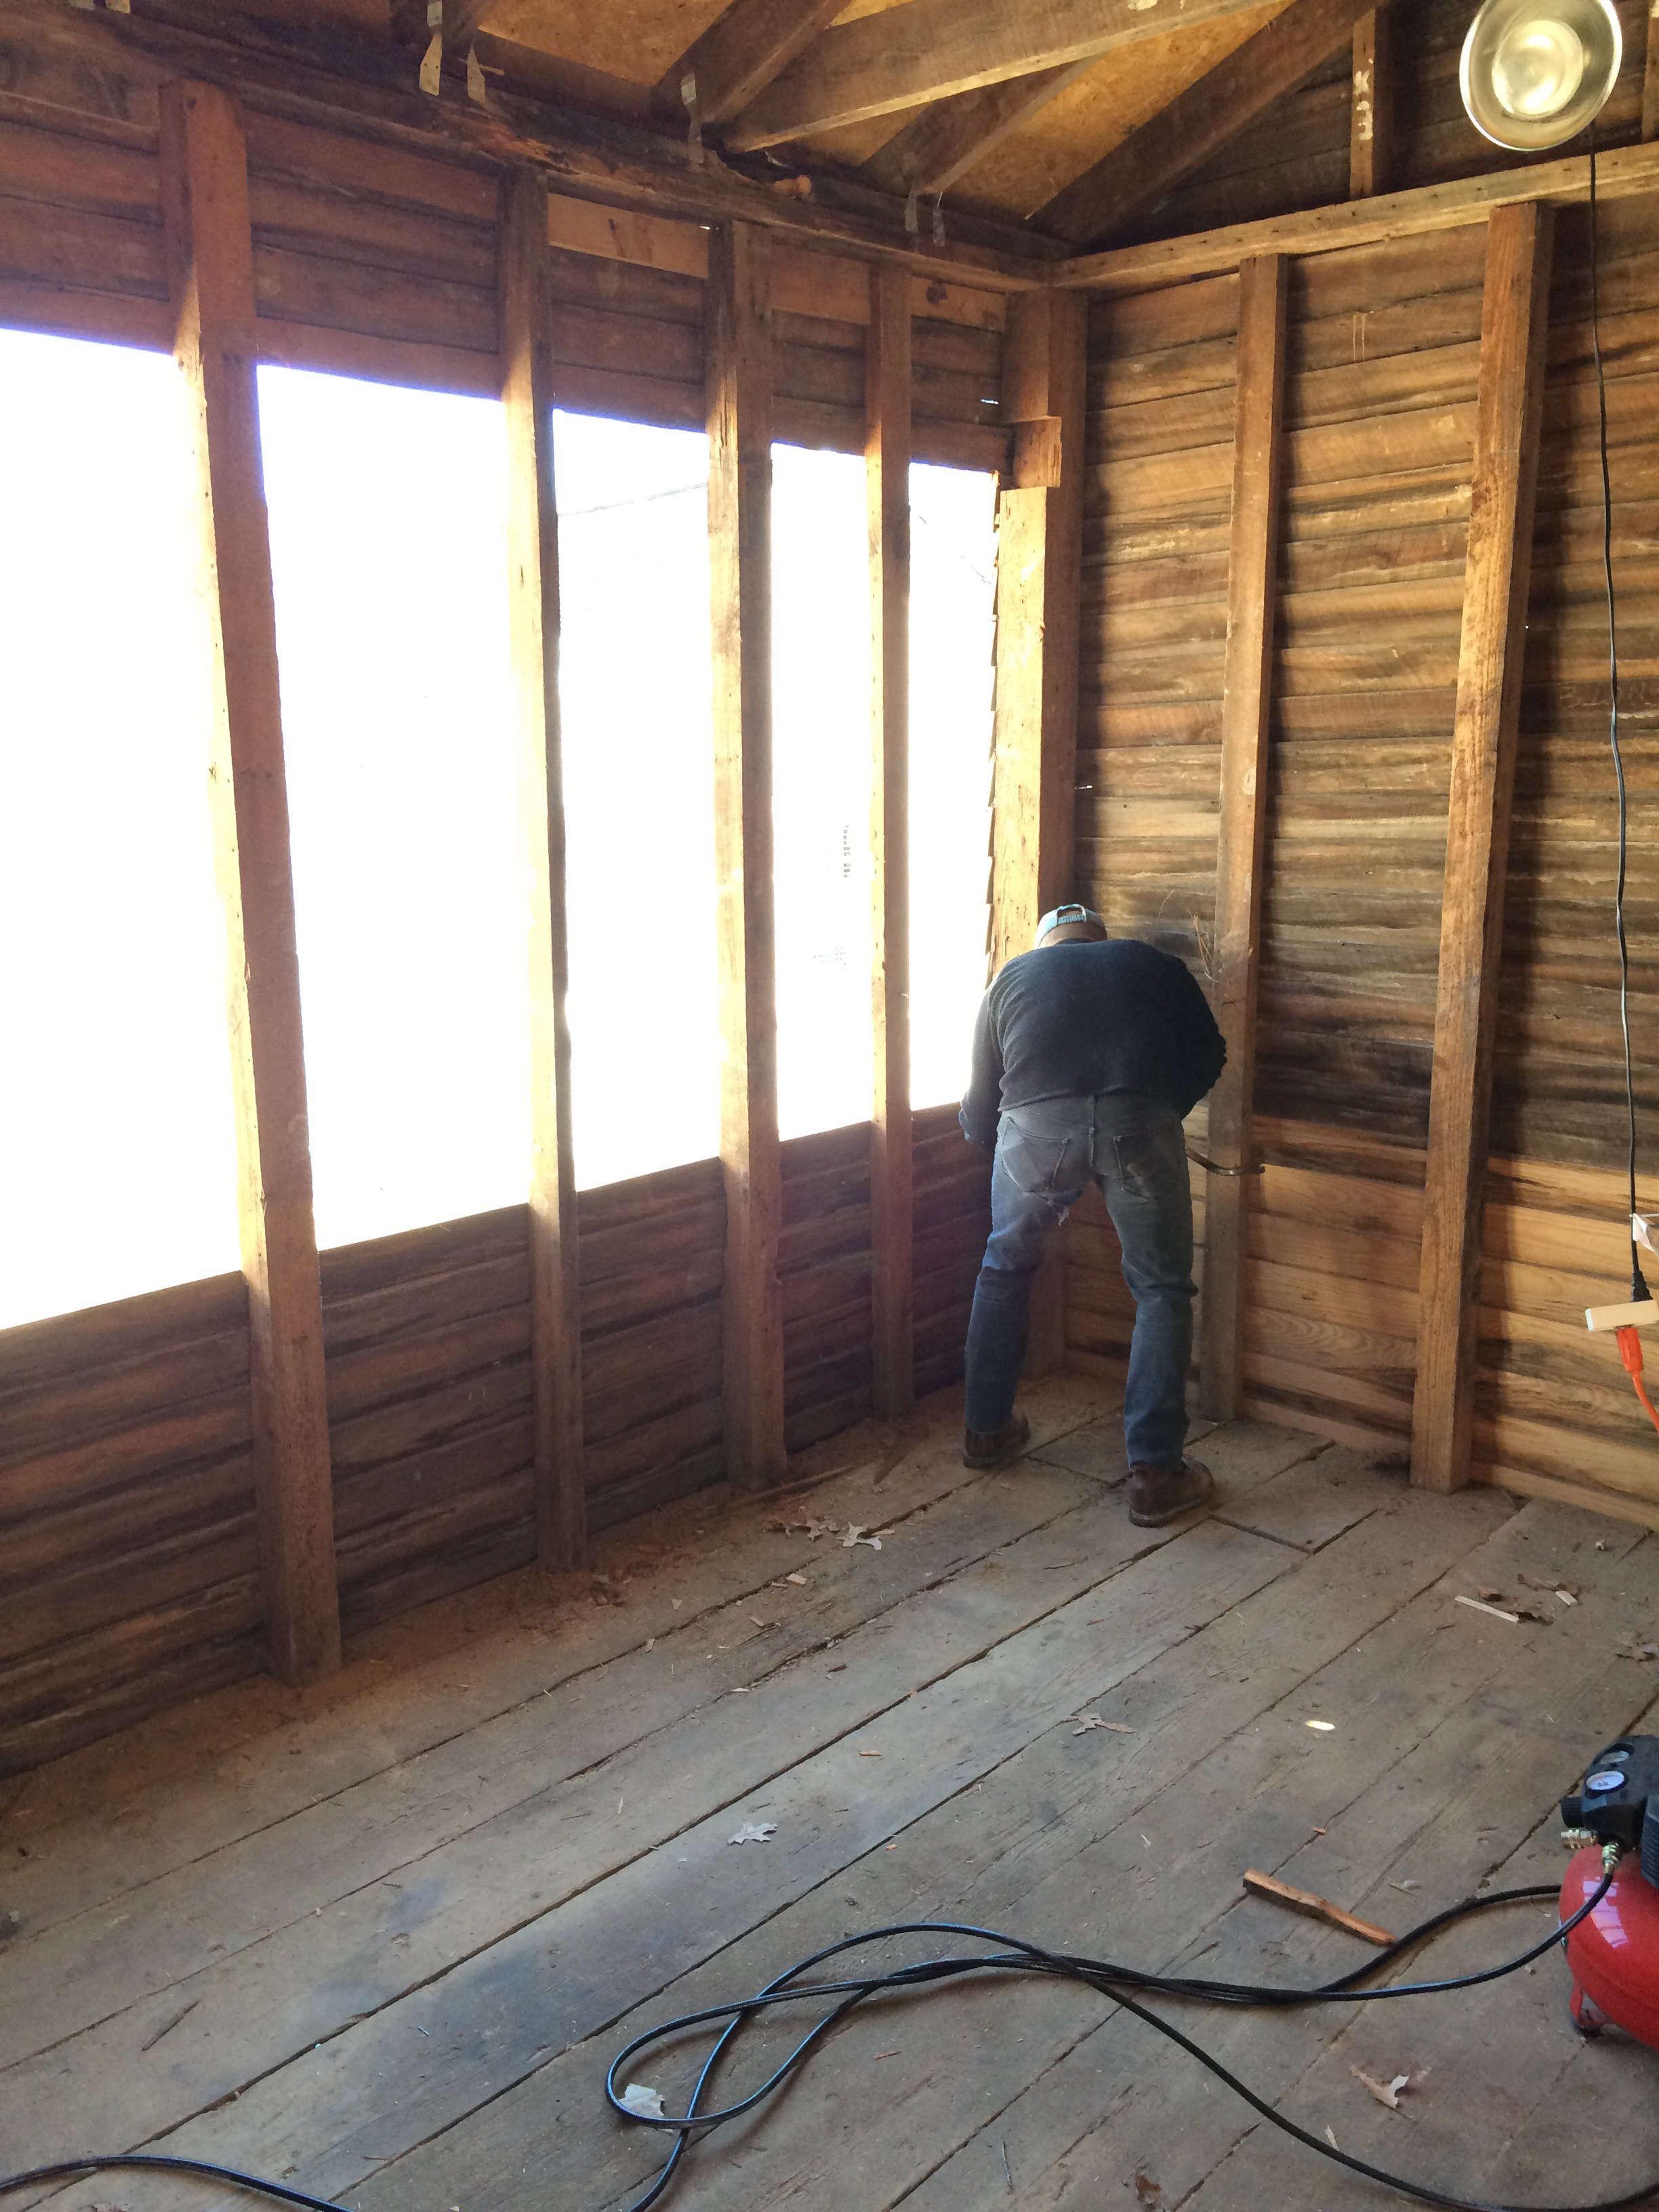 Good South Studio Window Framing, Photo by Chris and Elizabeth Boyette